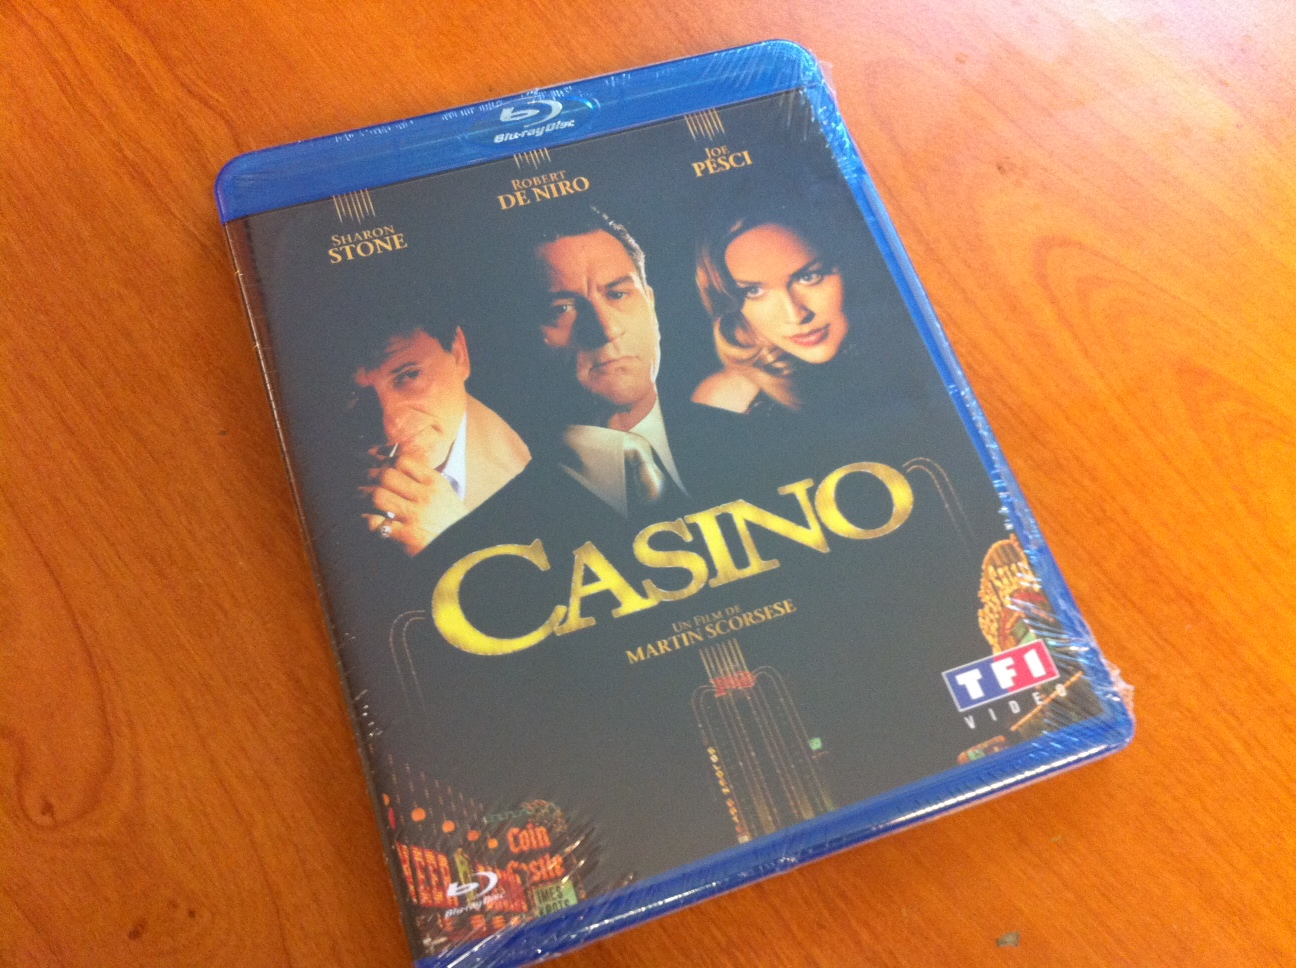 Casino steelbook amazon